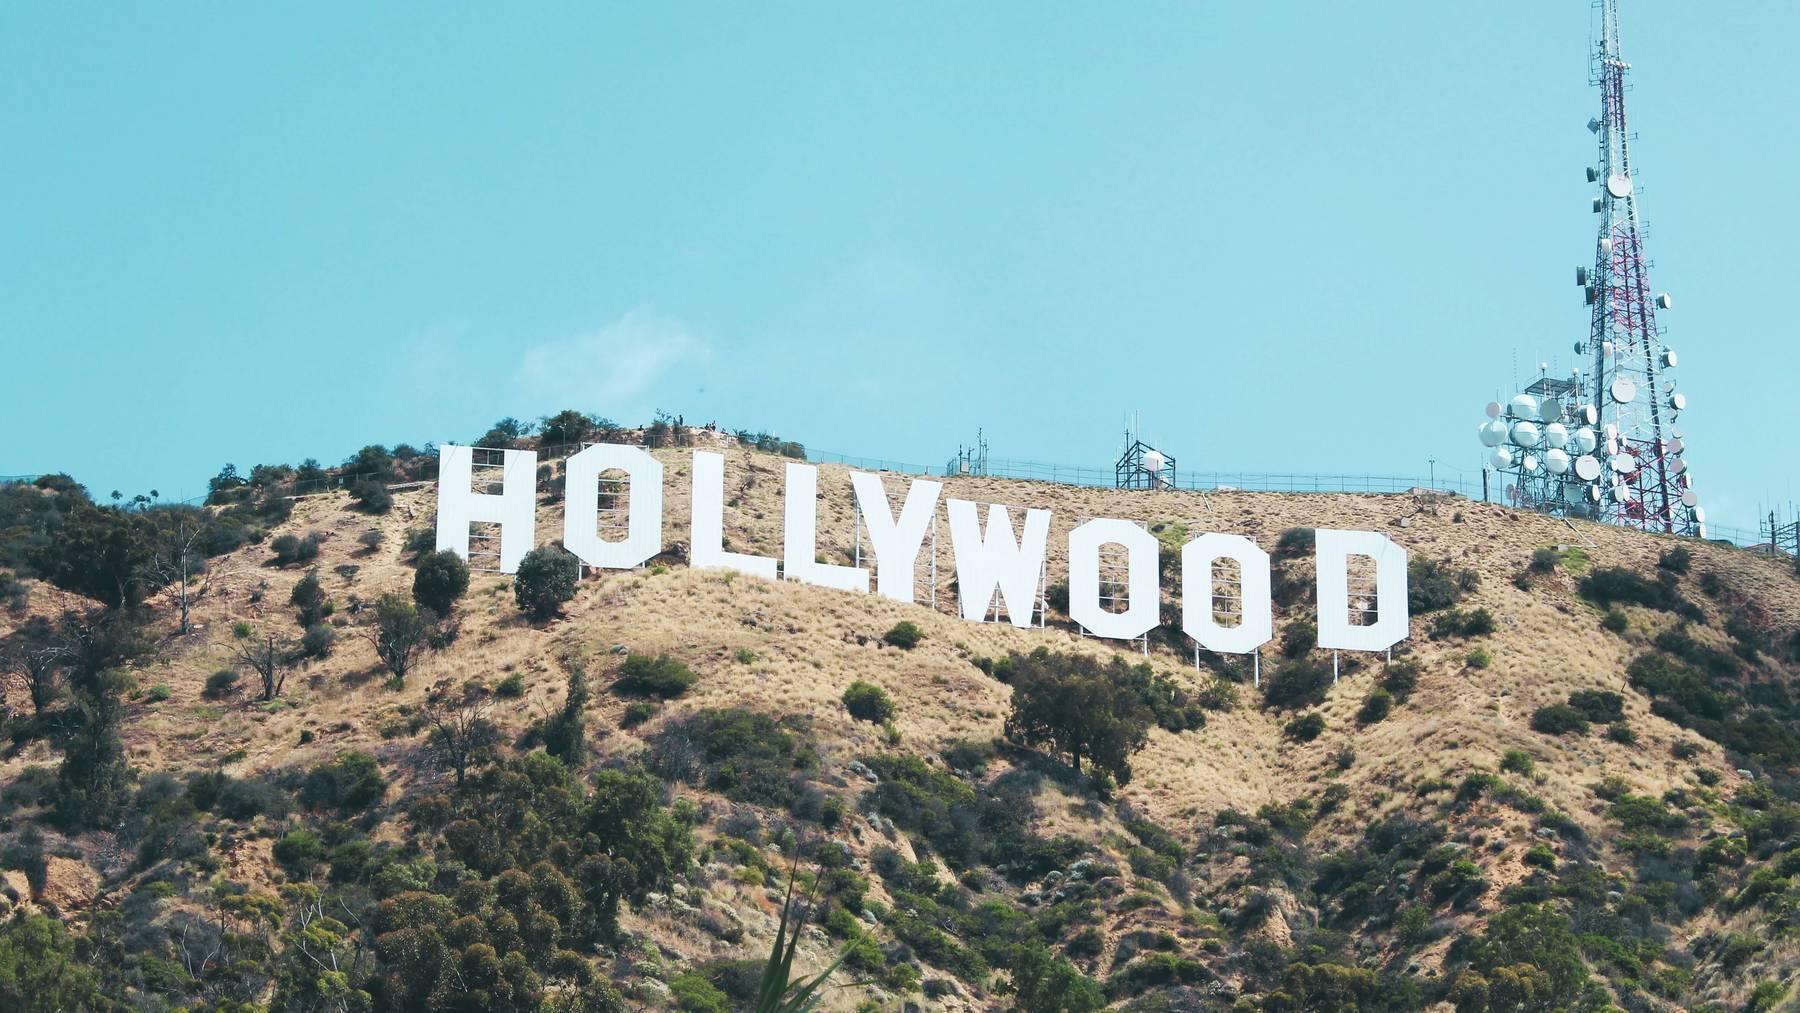 Hollywood_Unsplash